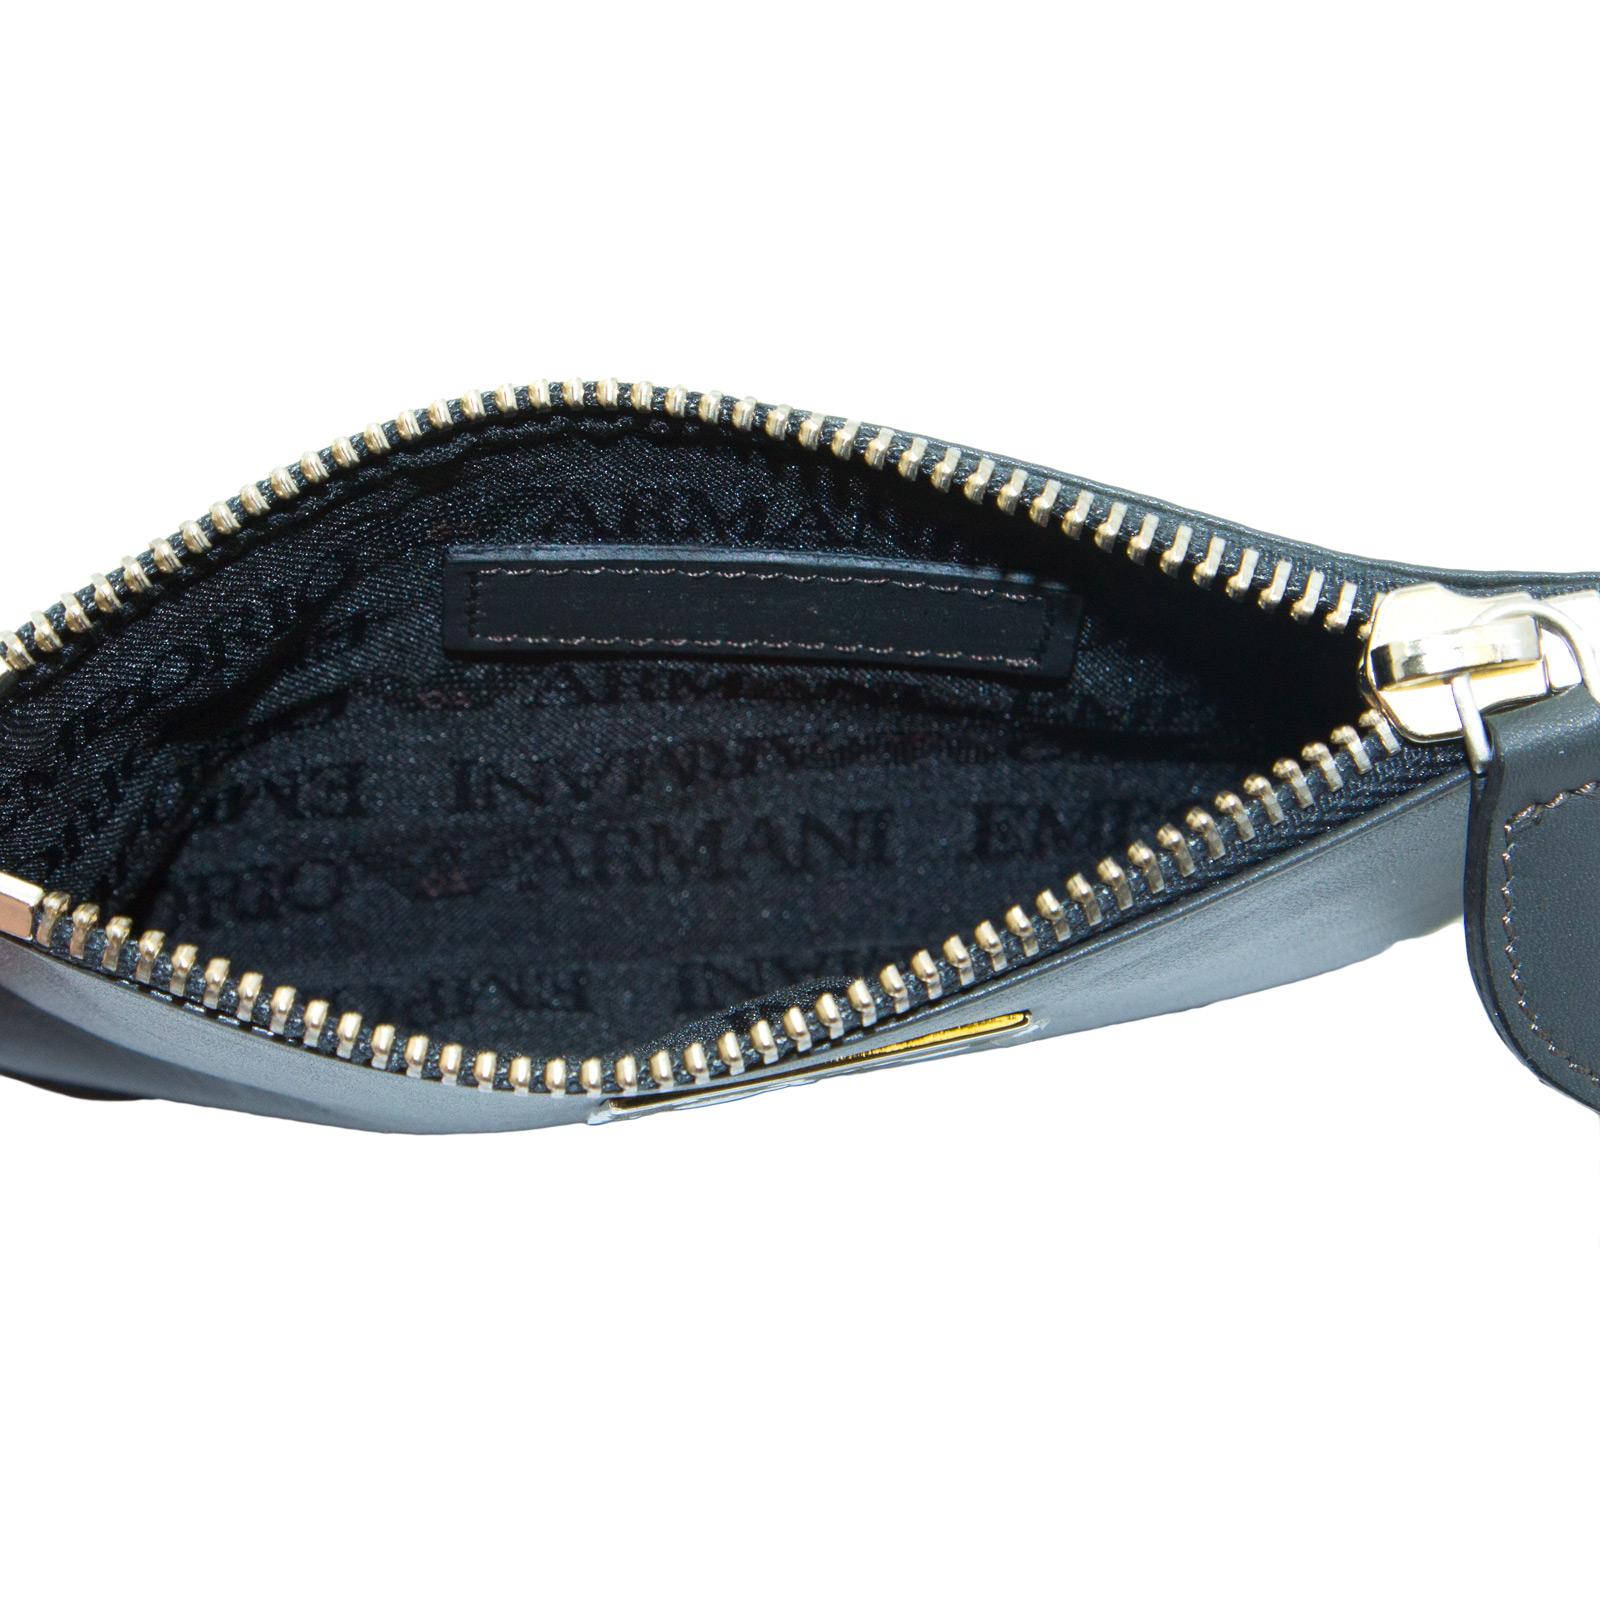 EMPORIO-ARMANI-Women-039-s-034-2012-034-Zip-Top-Coin-Purse-Wallet-YEMG99-195-NWT thumbnail 7